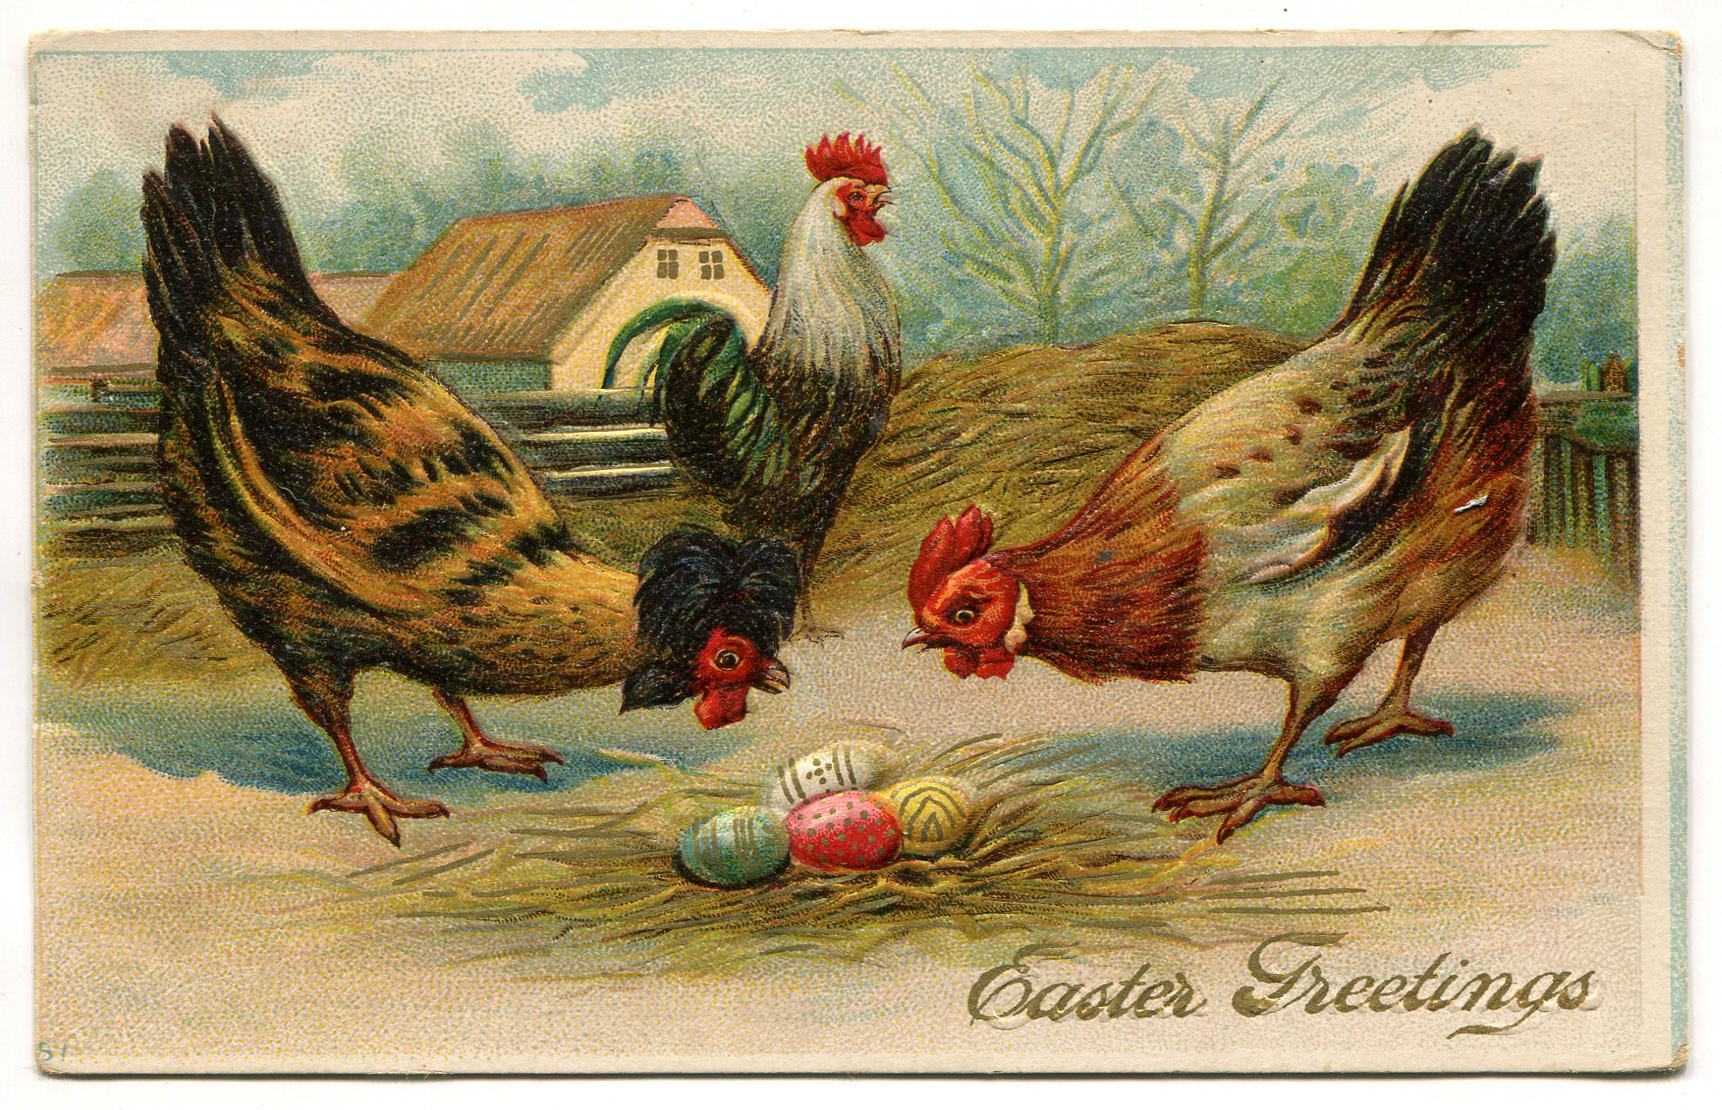 Antique Postcards Group 3 Shellie Lewis' Blog